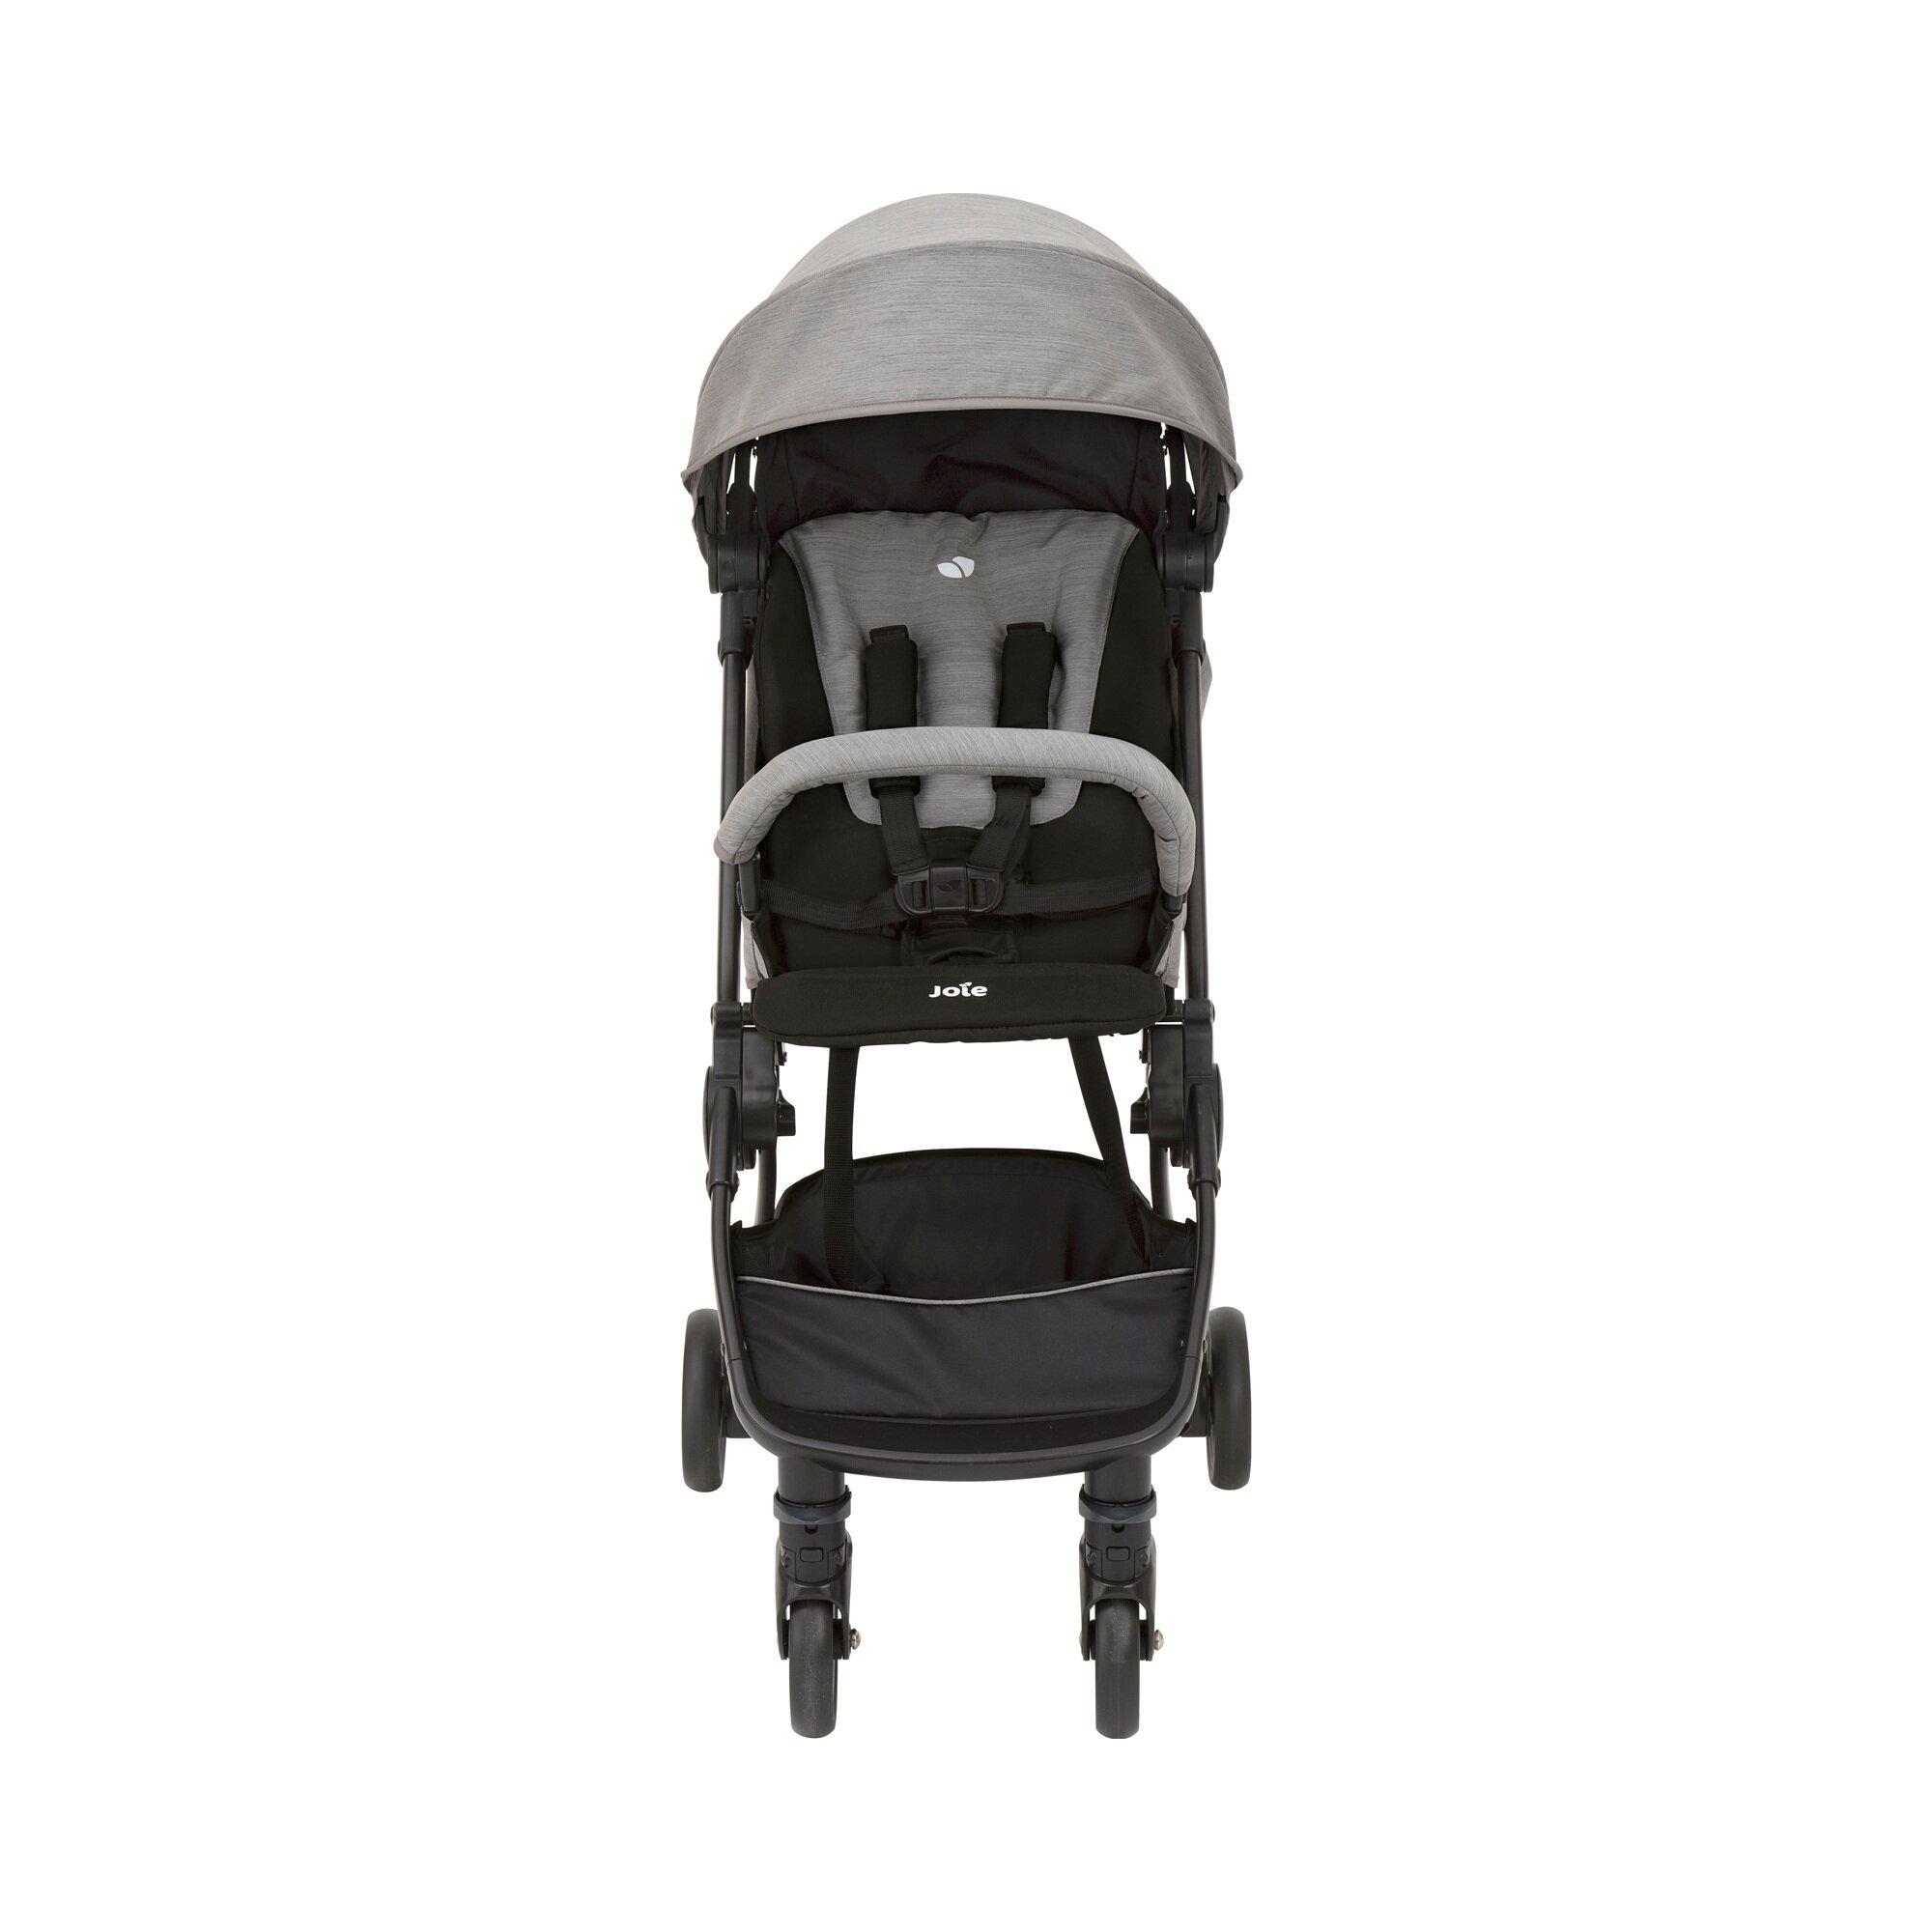 joie-pact-lite-buggy-design-2018-grau